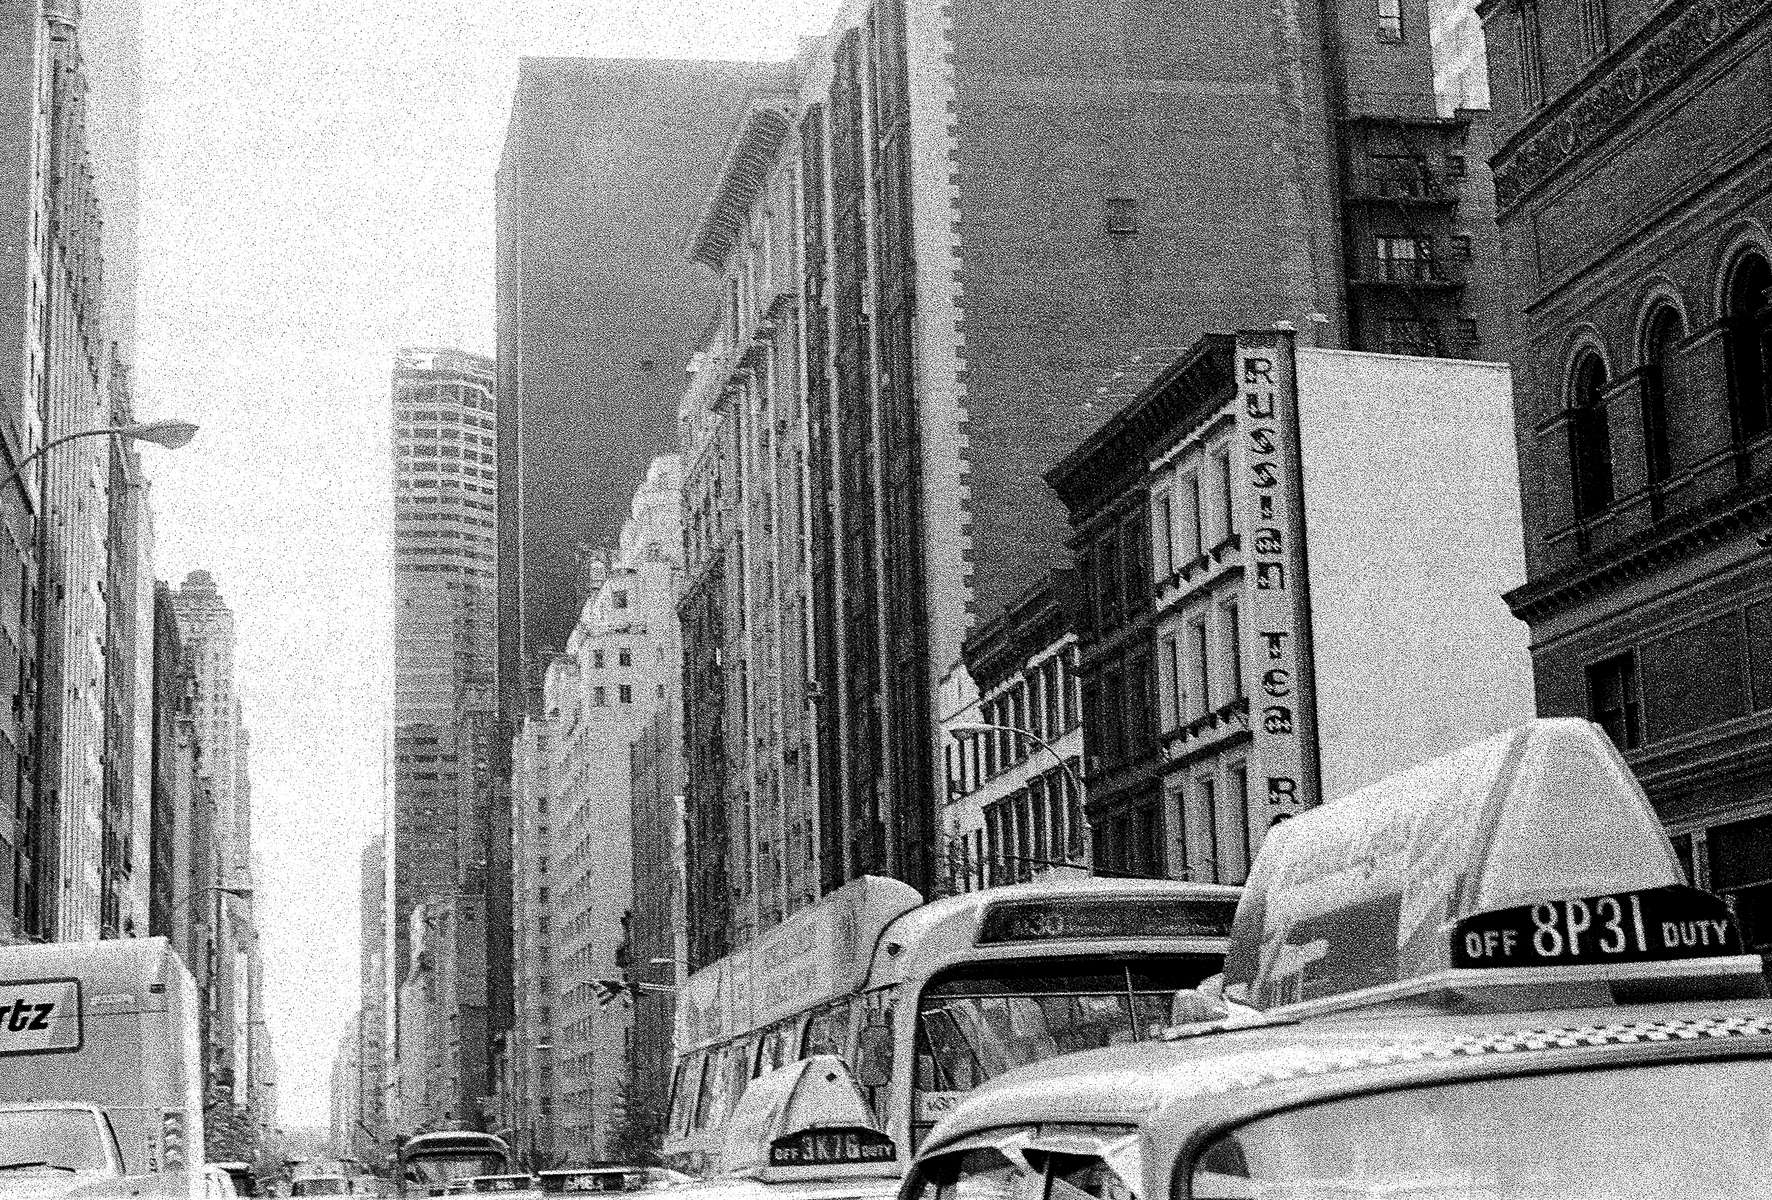 shot for Top Stories #9: N.Y.C. in 1979  by Kathy Acker